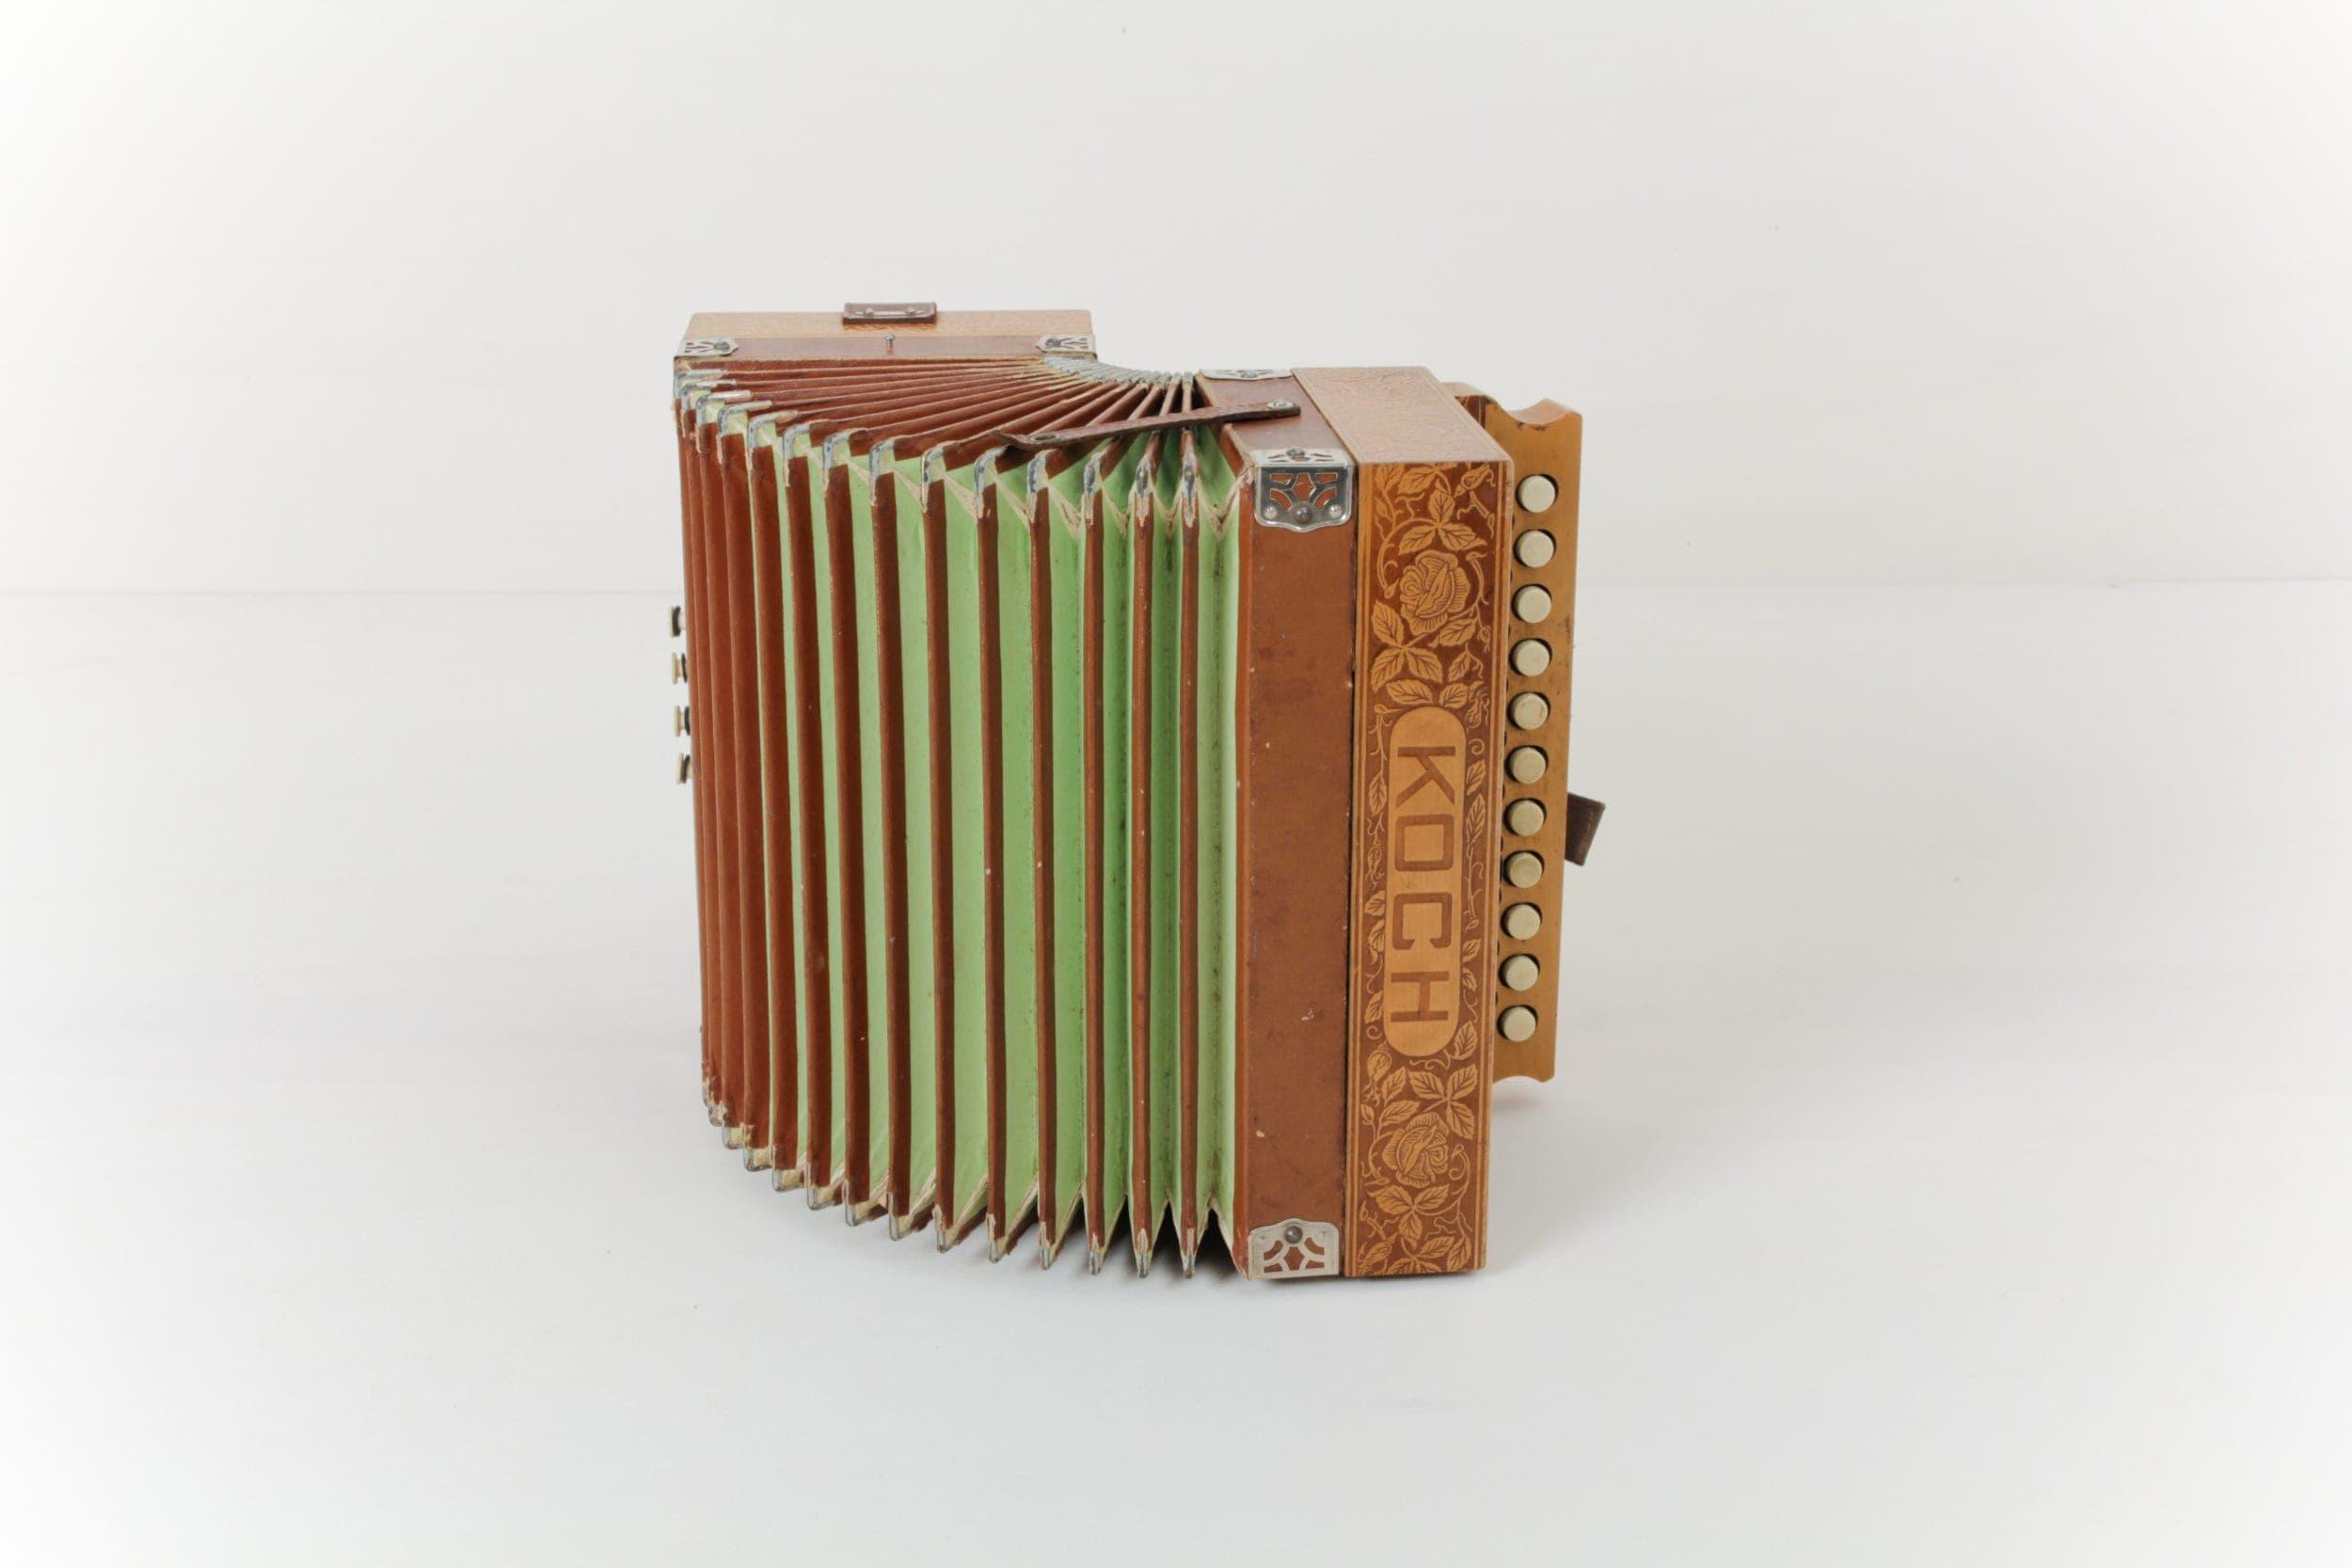 Akkordeon Honorato | Dekoratives Akkordeon in tollen Farben. | gotvintage Rental & Event Design